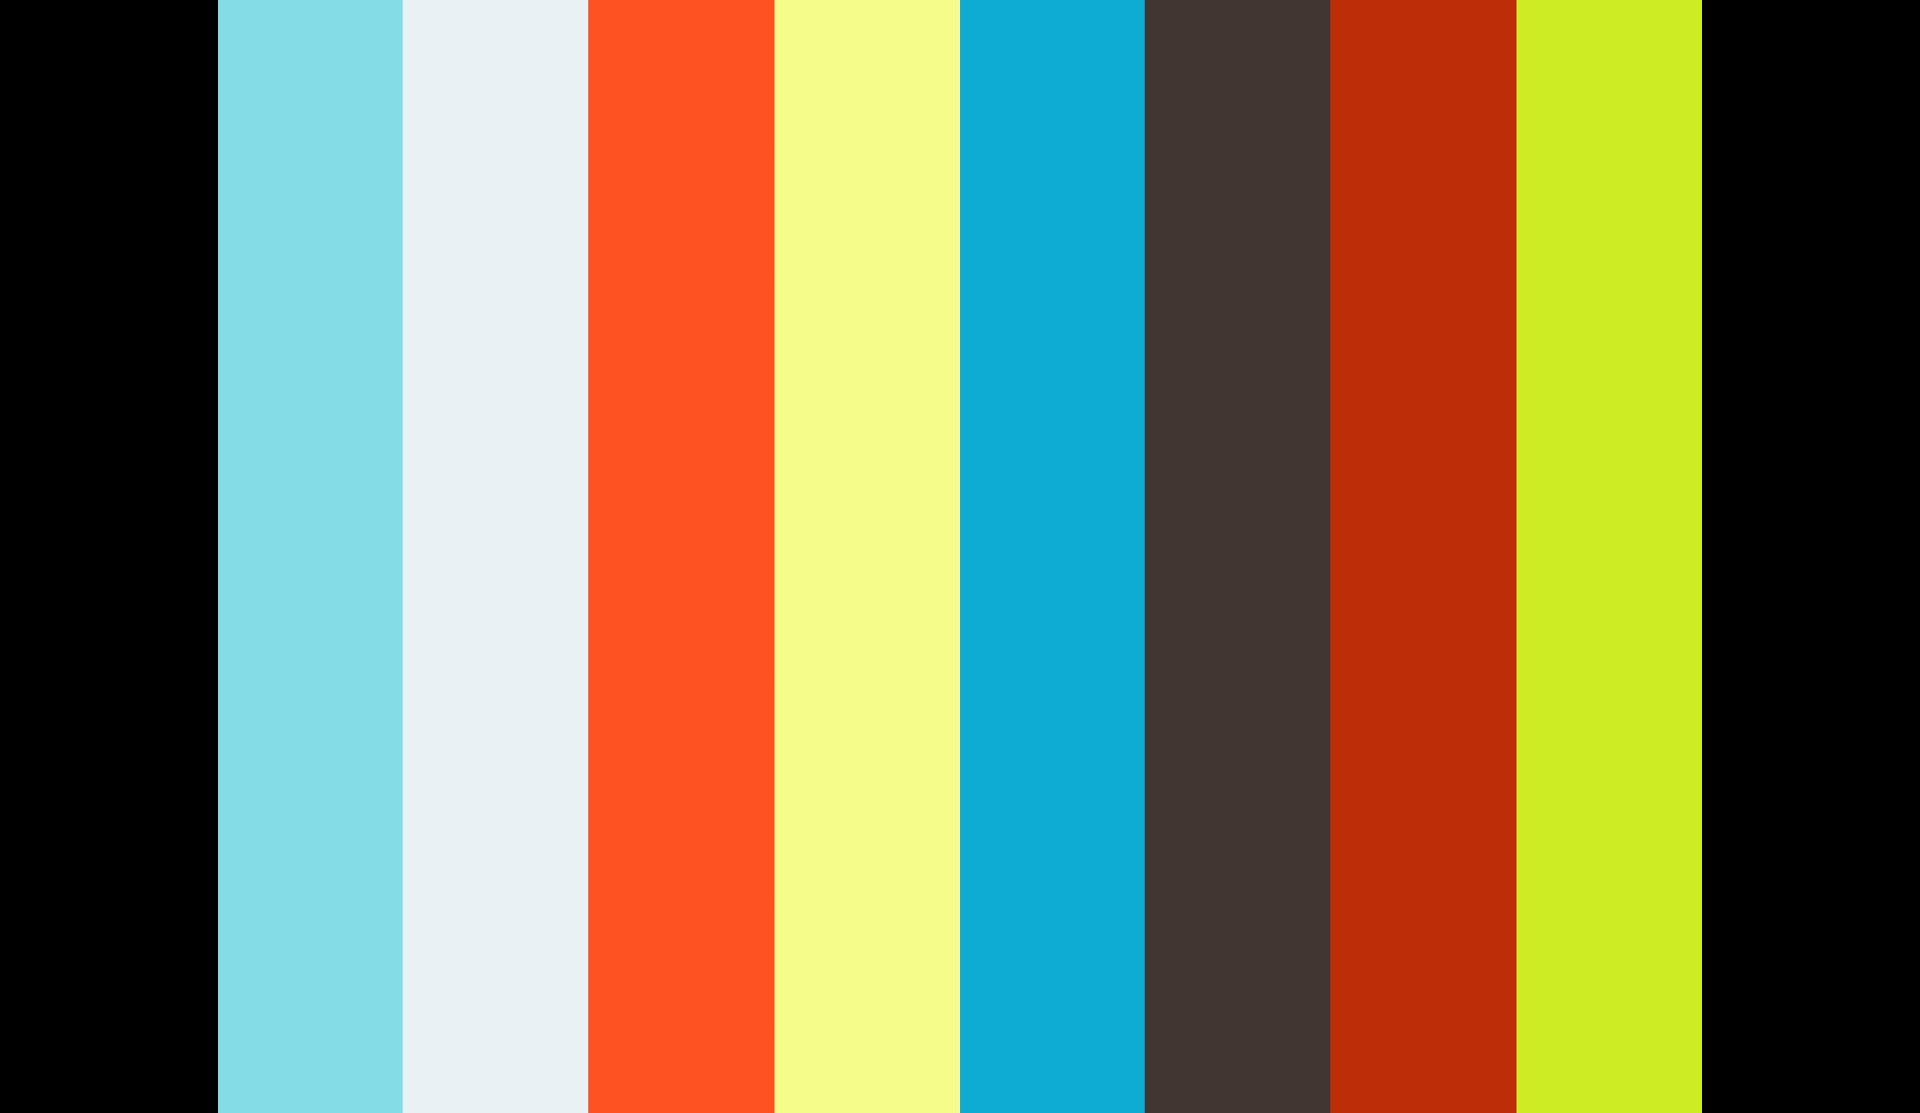 2021_06_28 - Brad - SCOOP 1k Series Saver Part 9